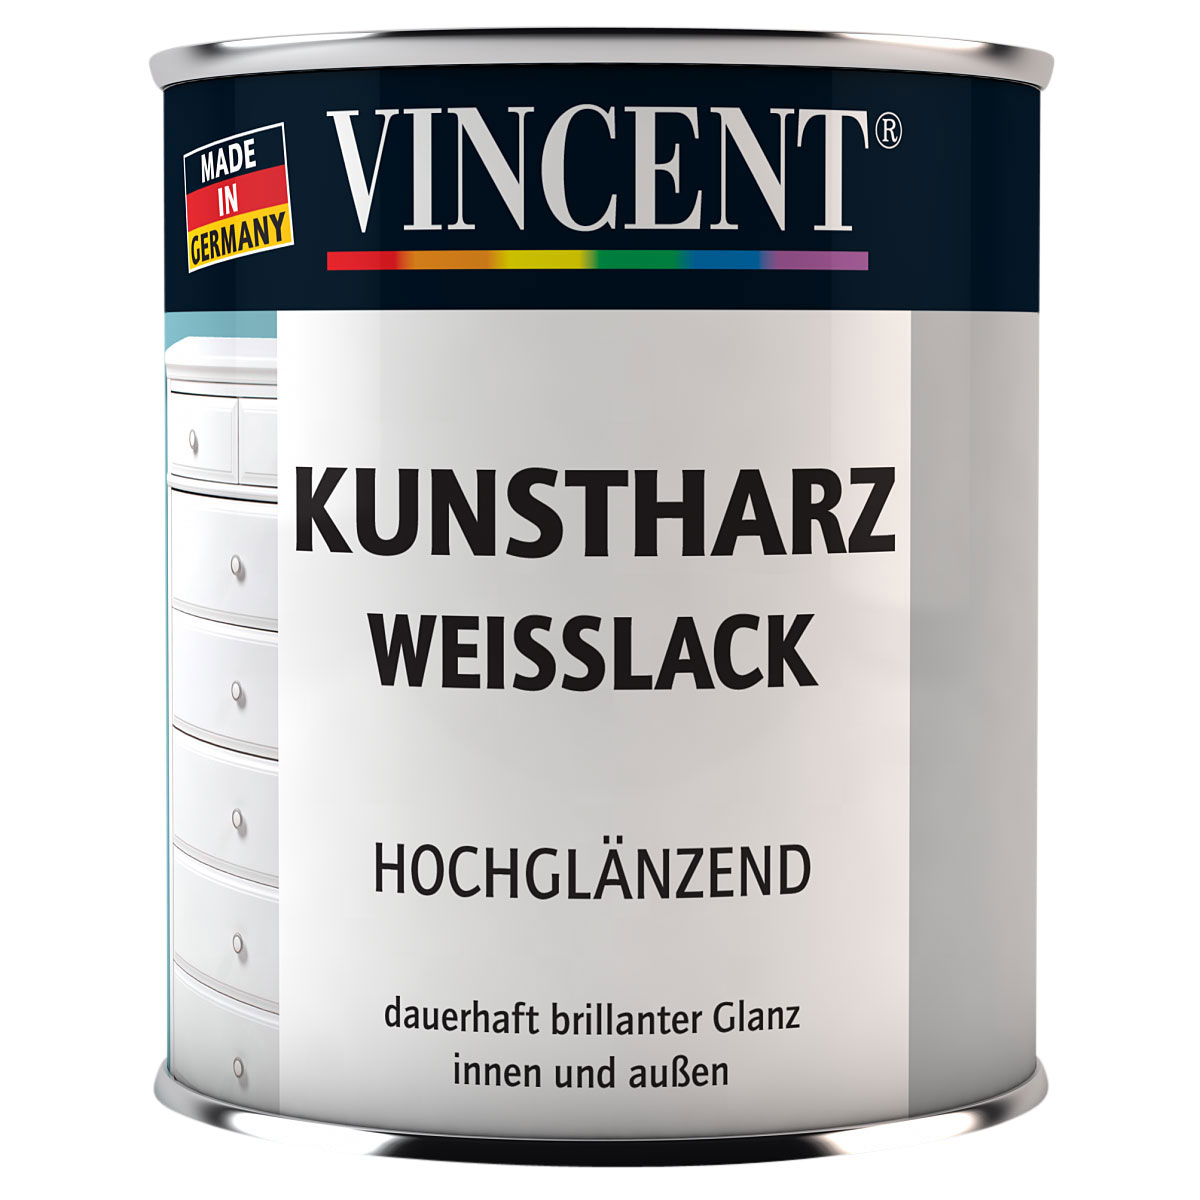 Vincent Weisslack hochglänzend 375 ml